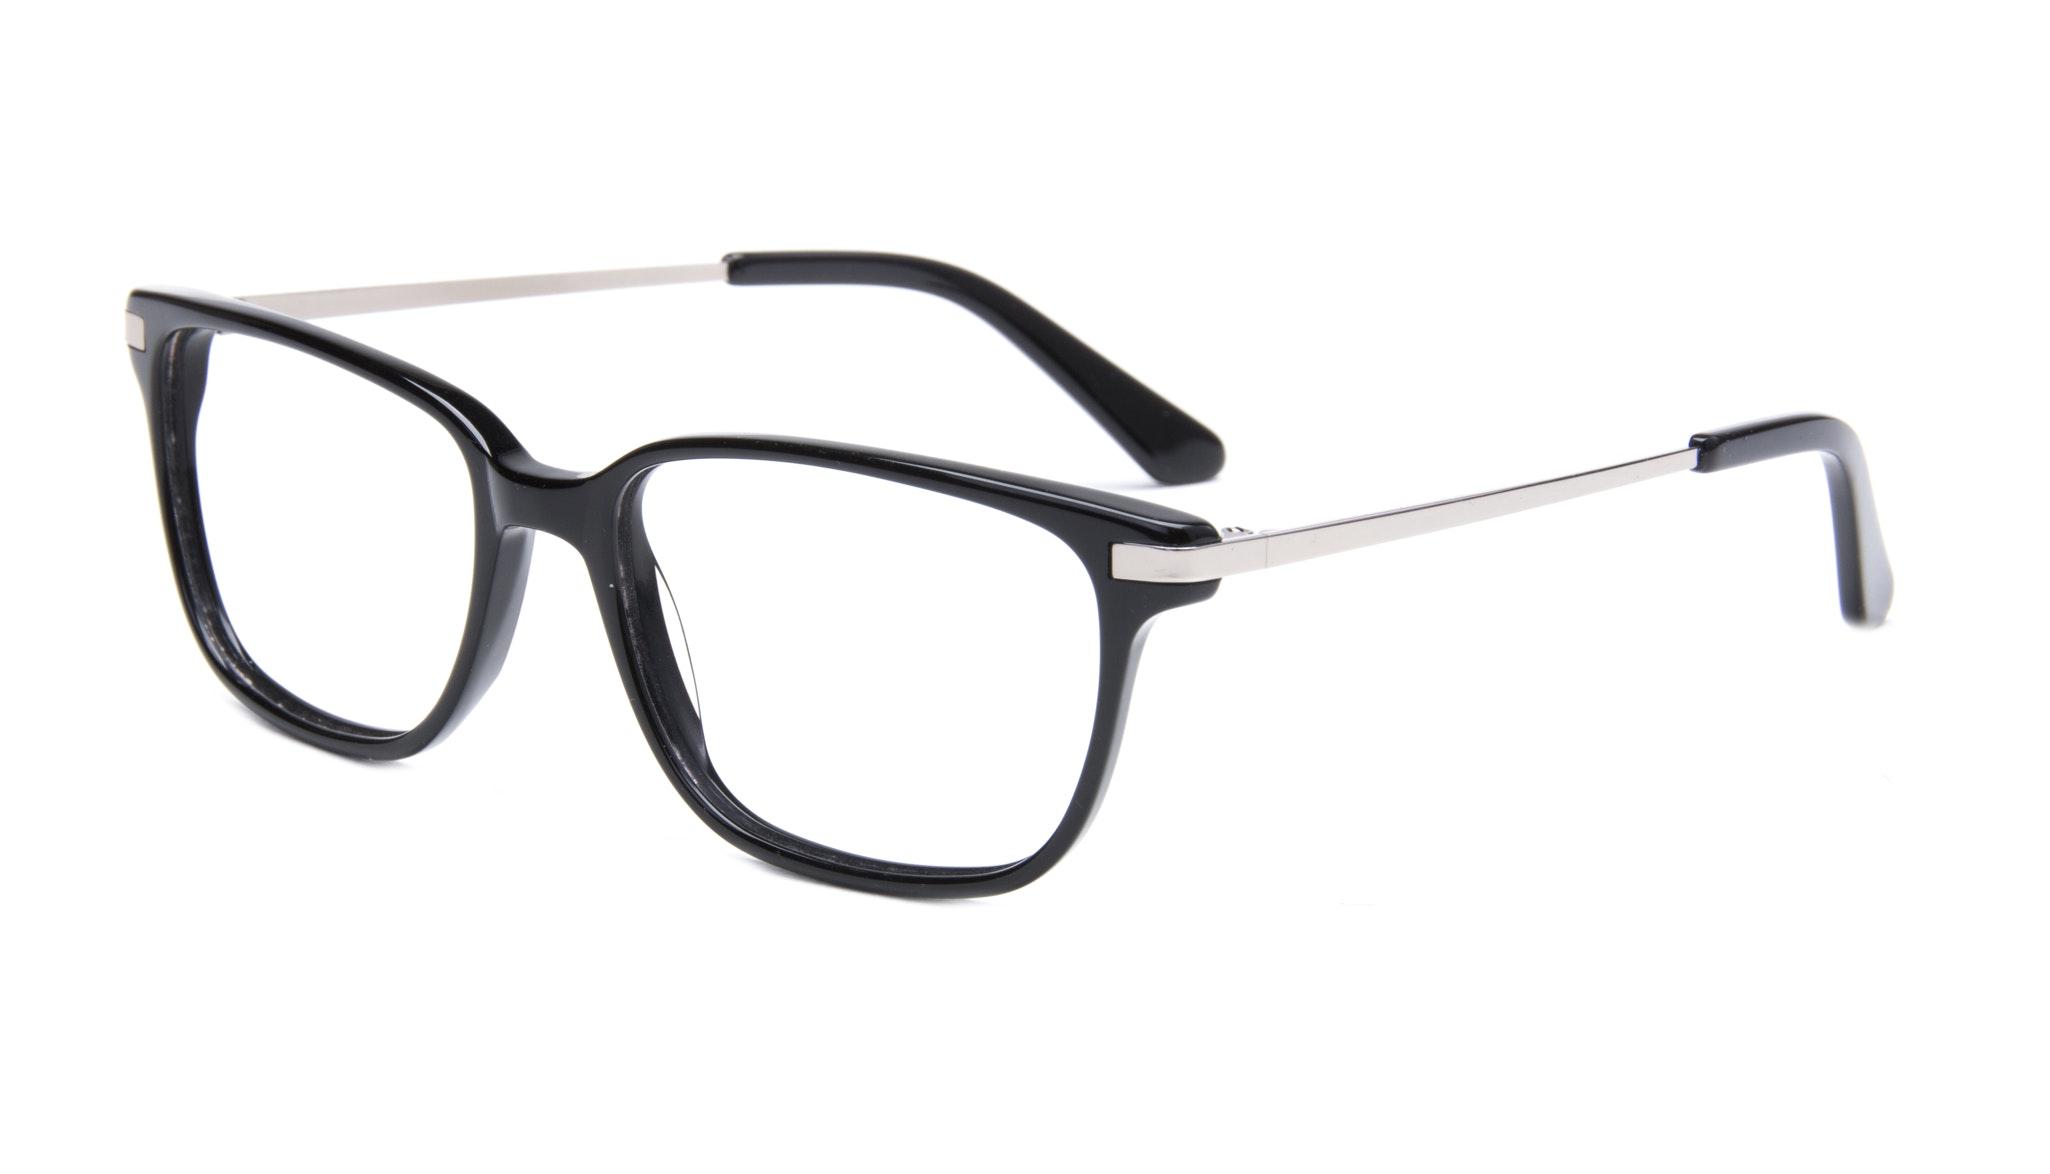 Affordable Fashion Glasses Rectangle Eyeglasses Men Trade Black Tilt